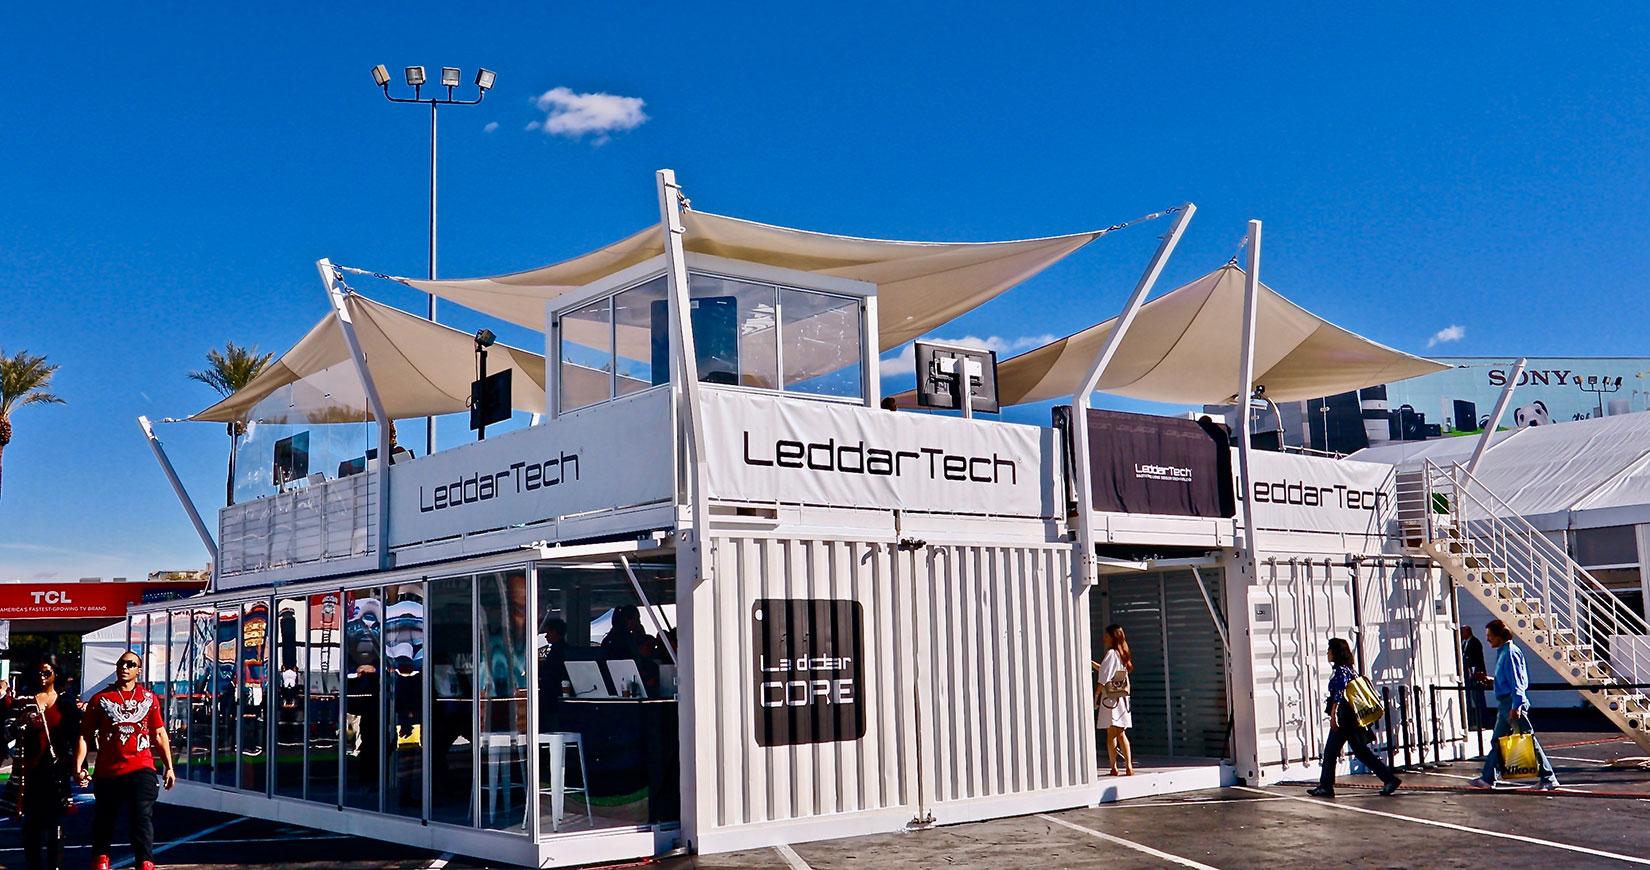 Leddartech Turning heads in Las Vegas